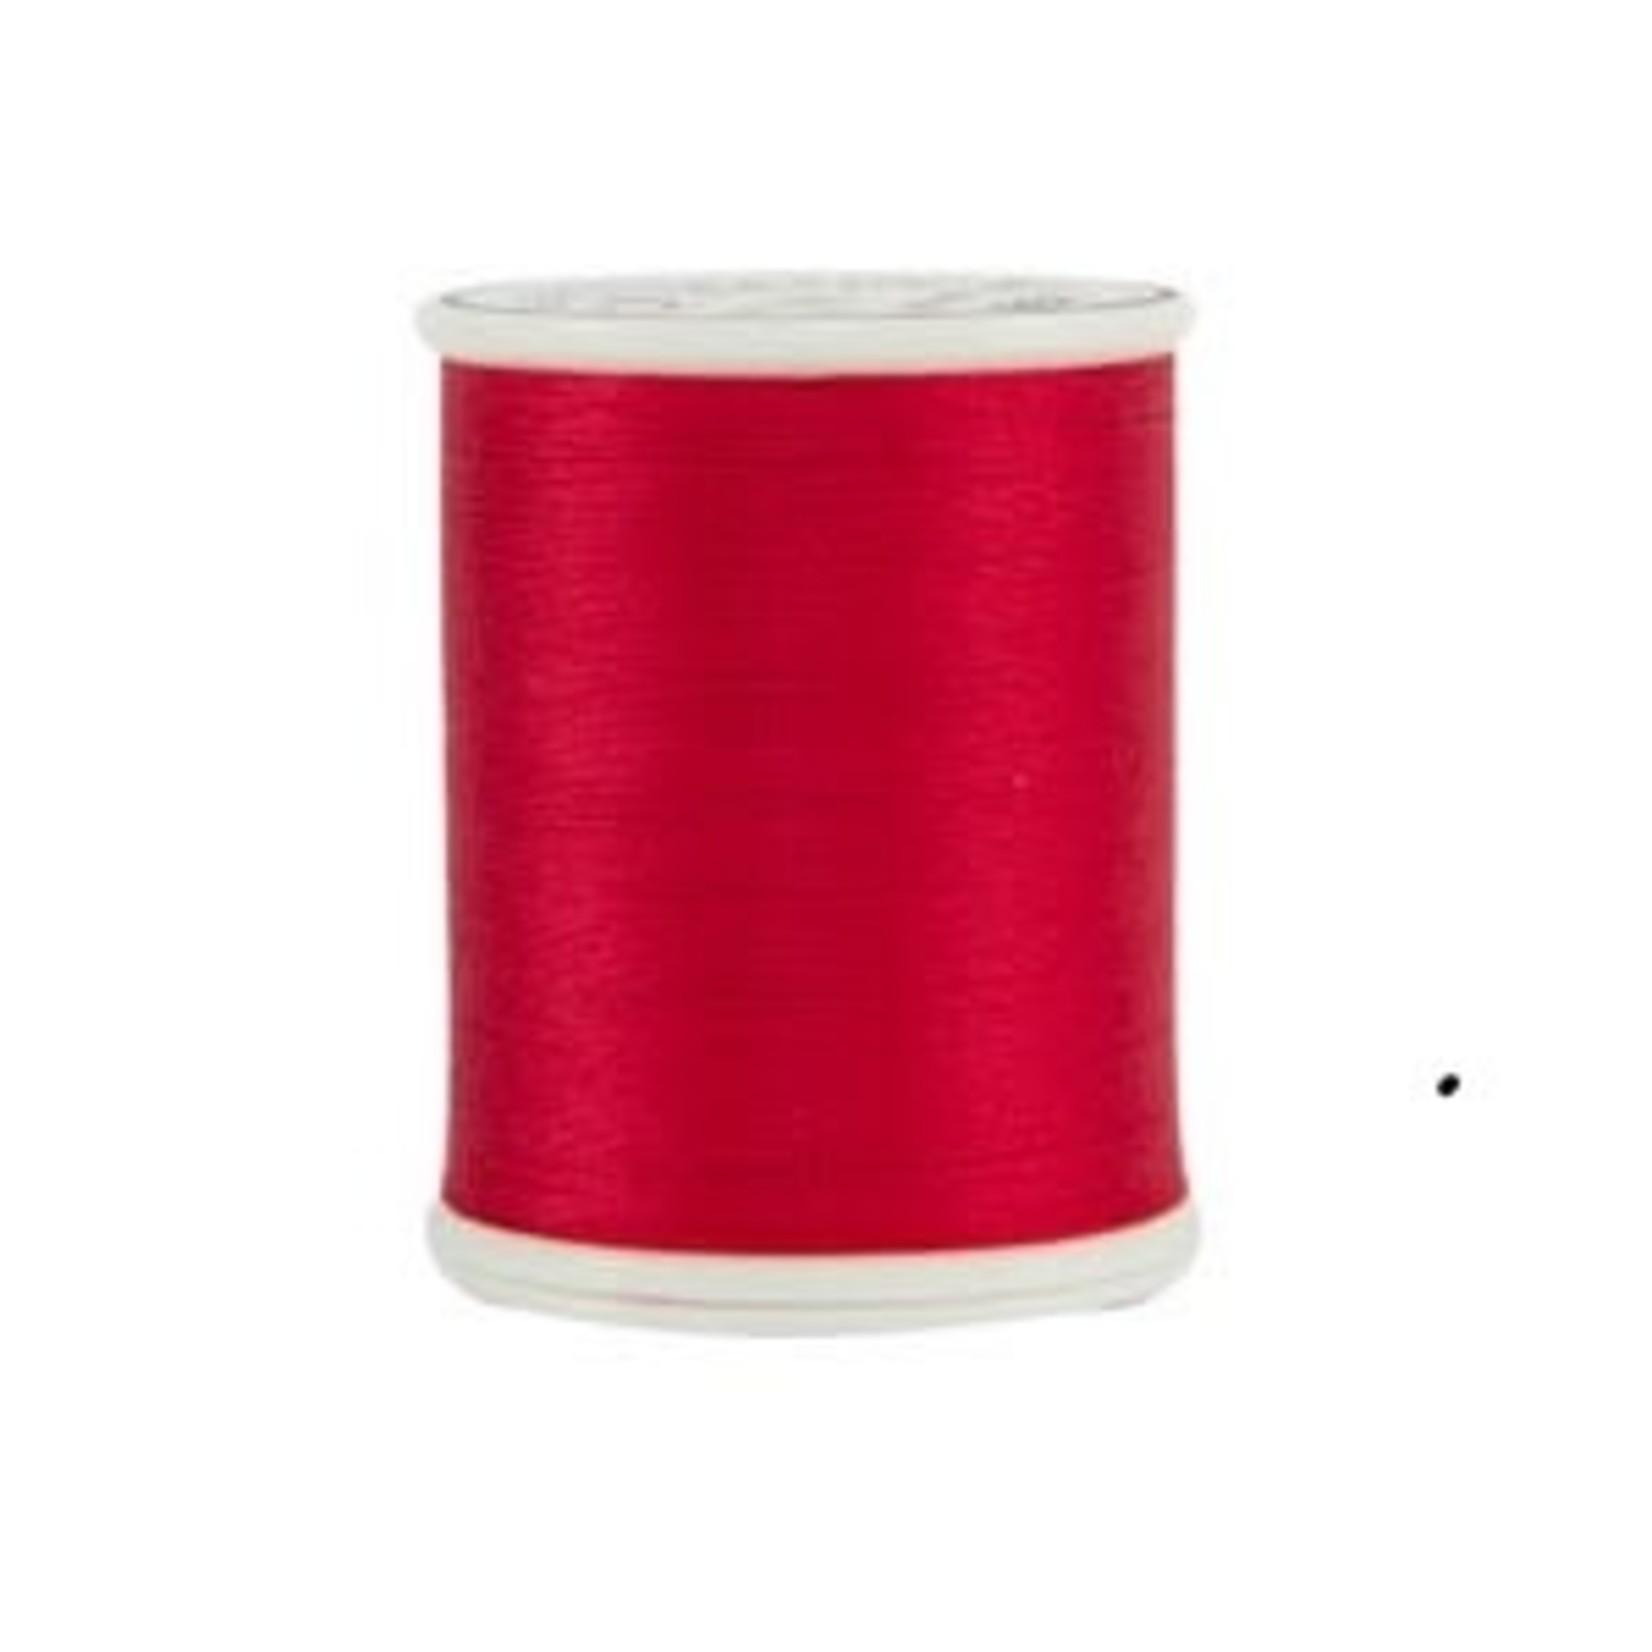 Superior Threads King Tut - #40 - 457 m - 1001 St. Nick